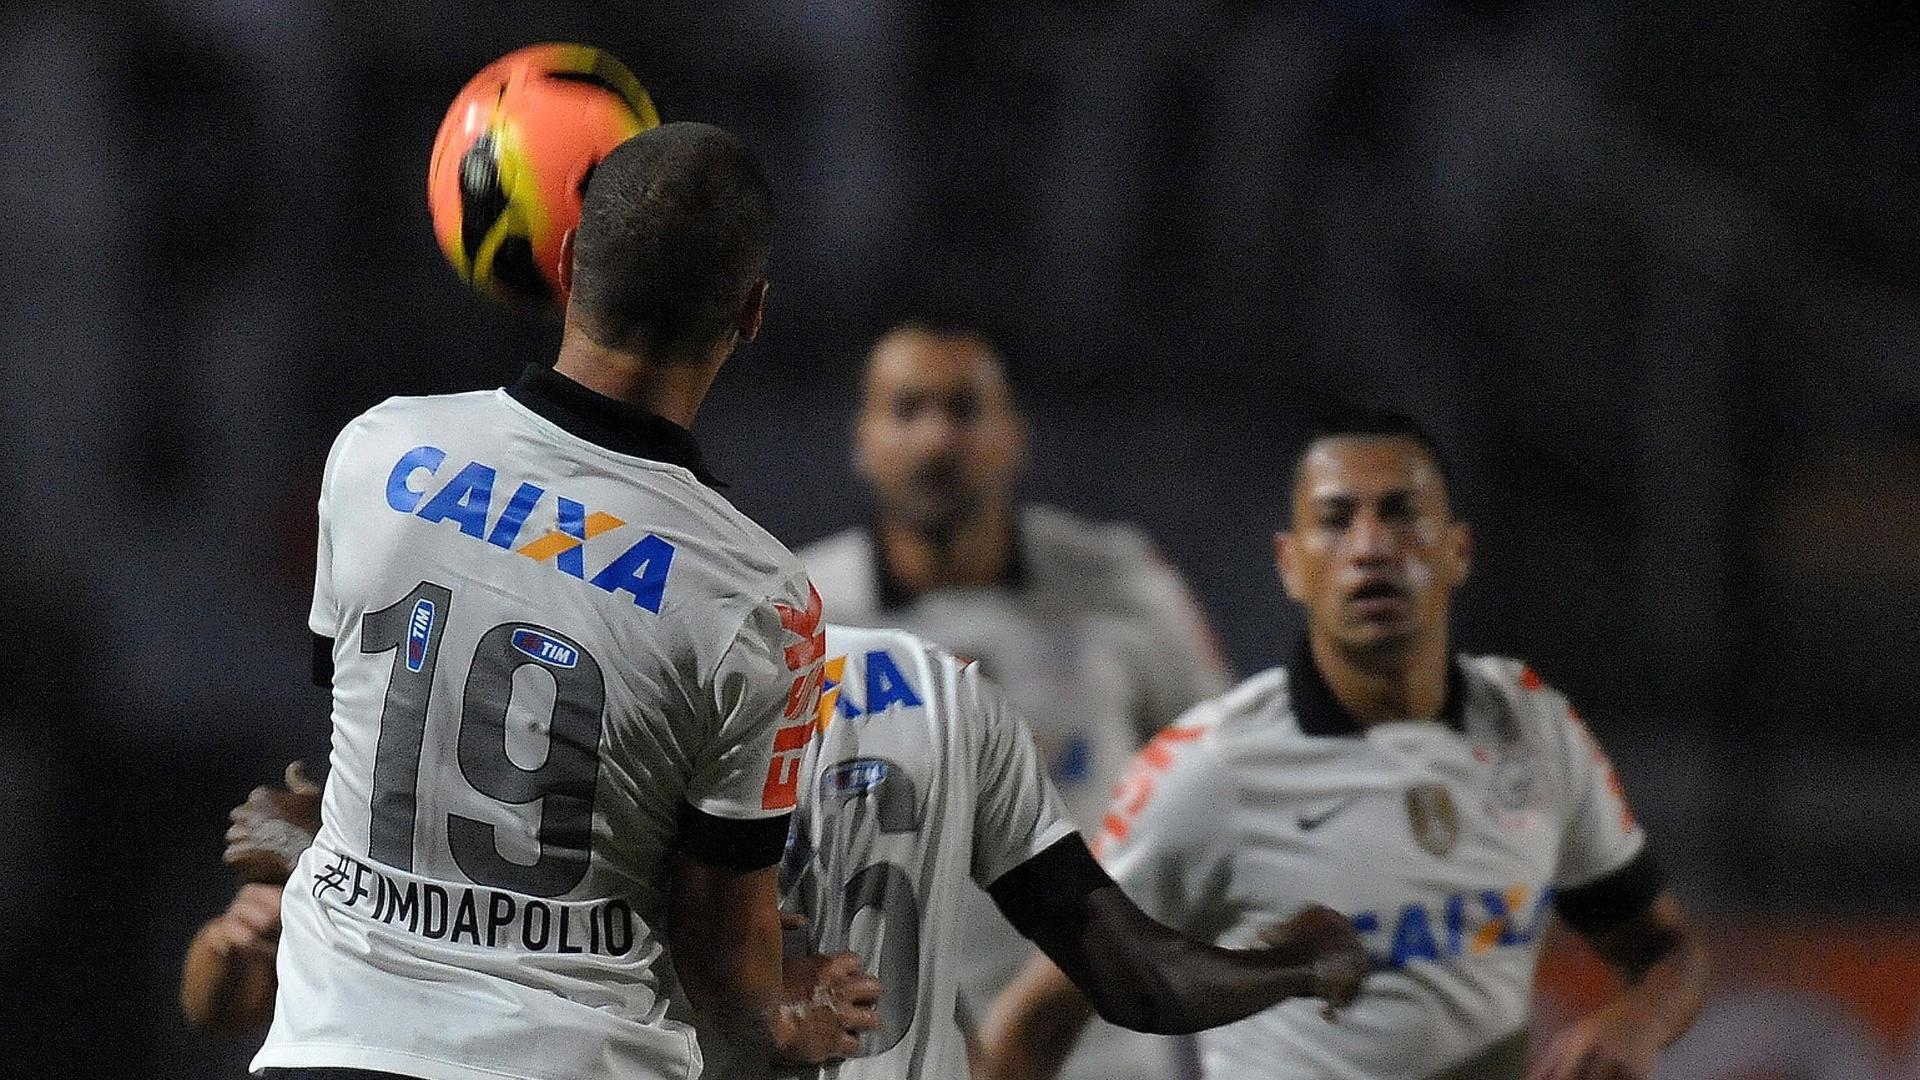 08.jun.2013 - Guilherme (e), do Corinthians, sobe para afastar a bola durante jogo contra a Portuguesa pelo Campeoanto Brasileiro